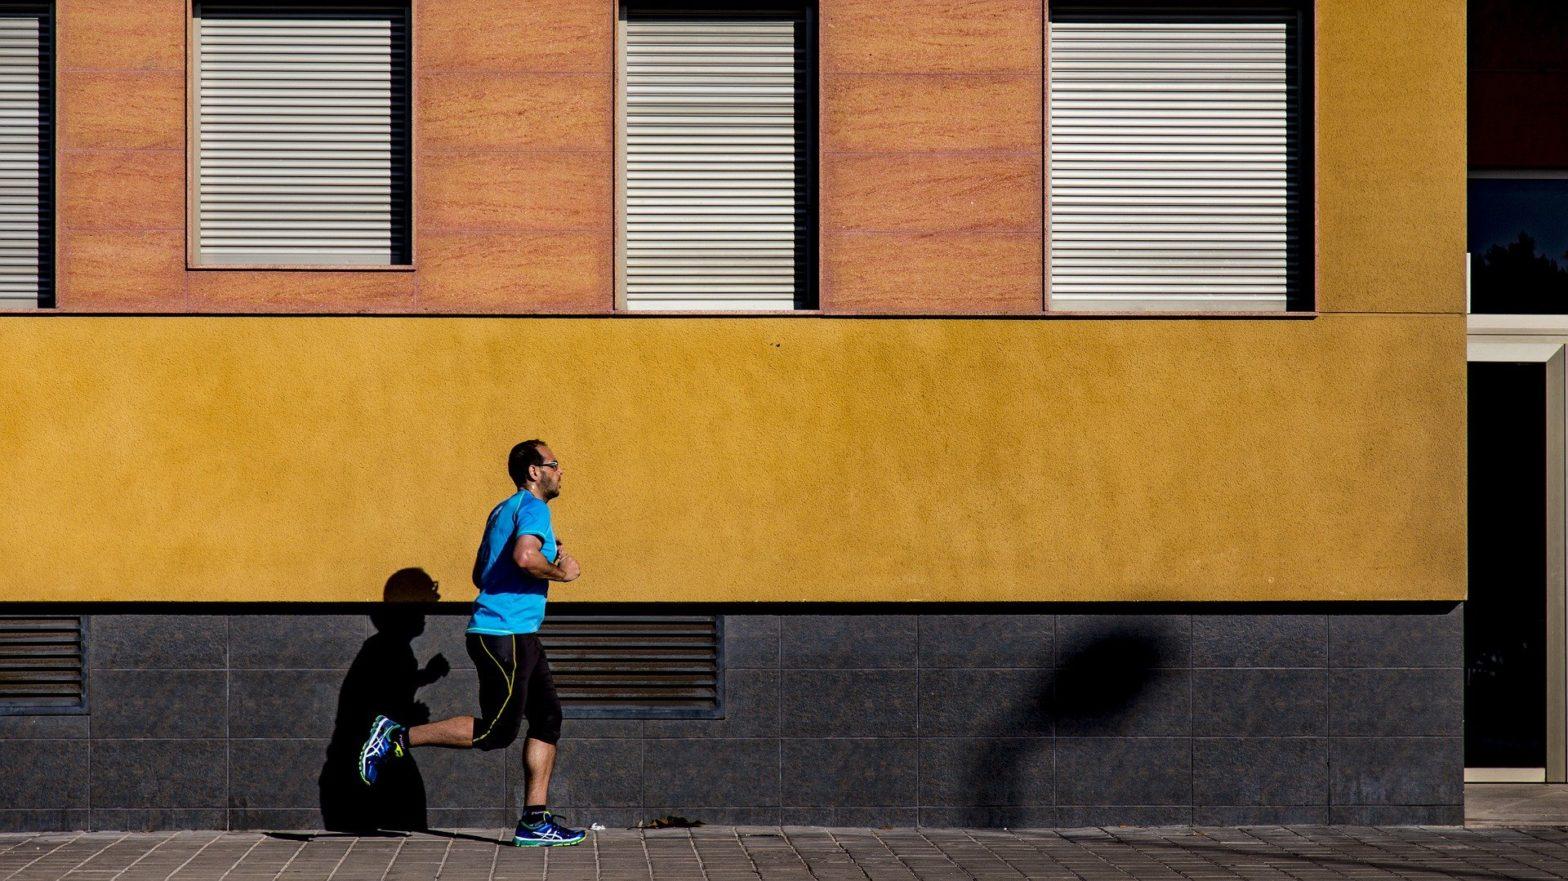 novas-recomendacoes-de-exercicio-fisico-minuto-saudavel